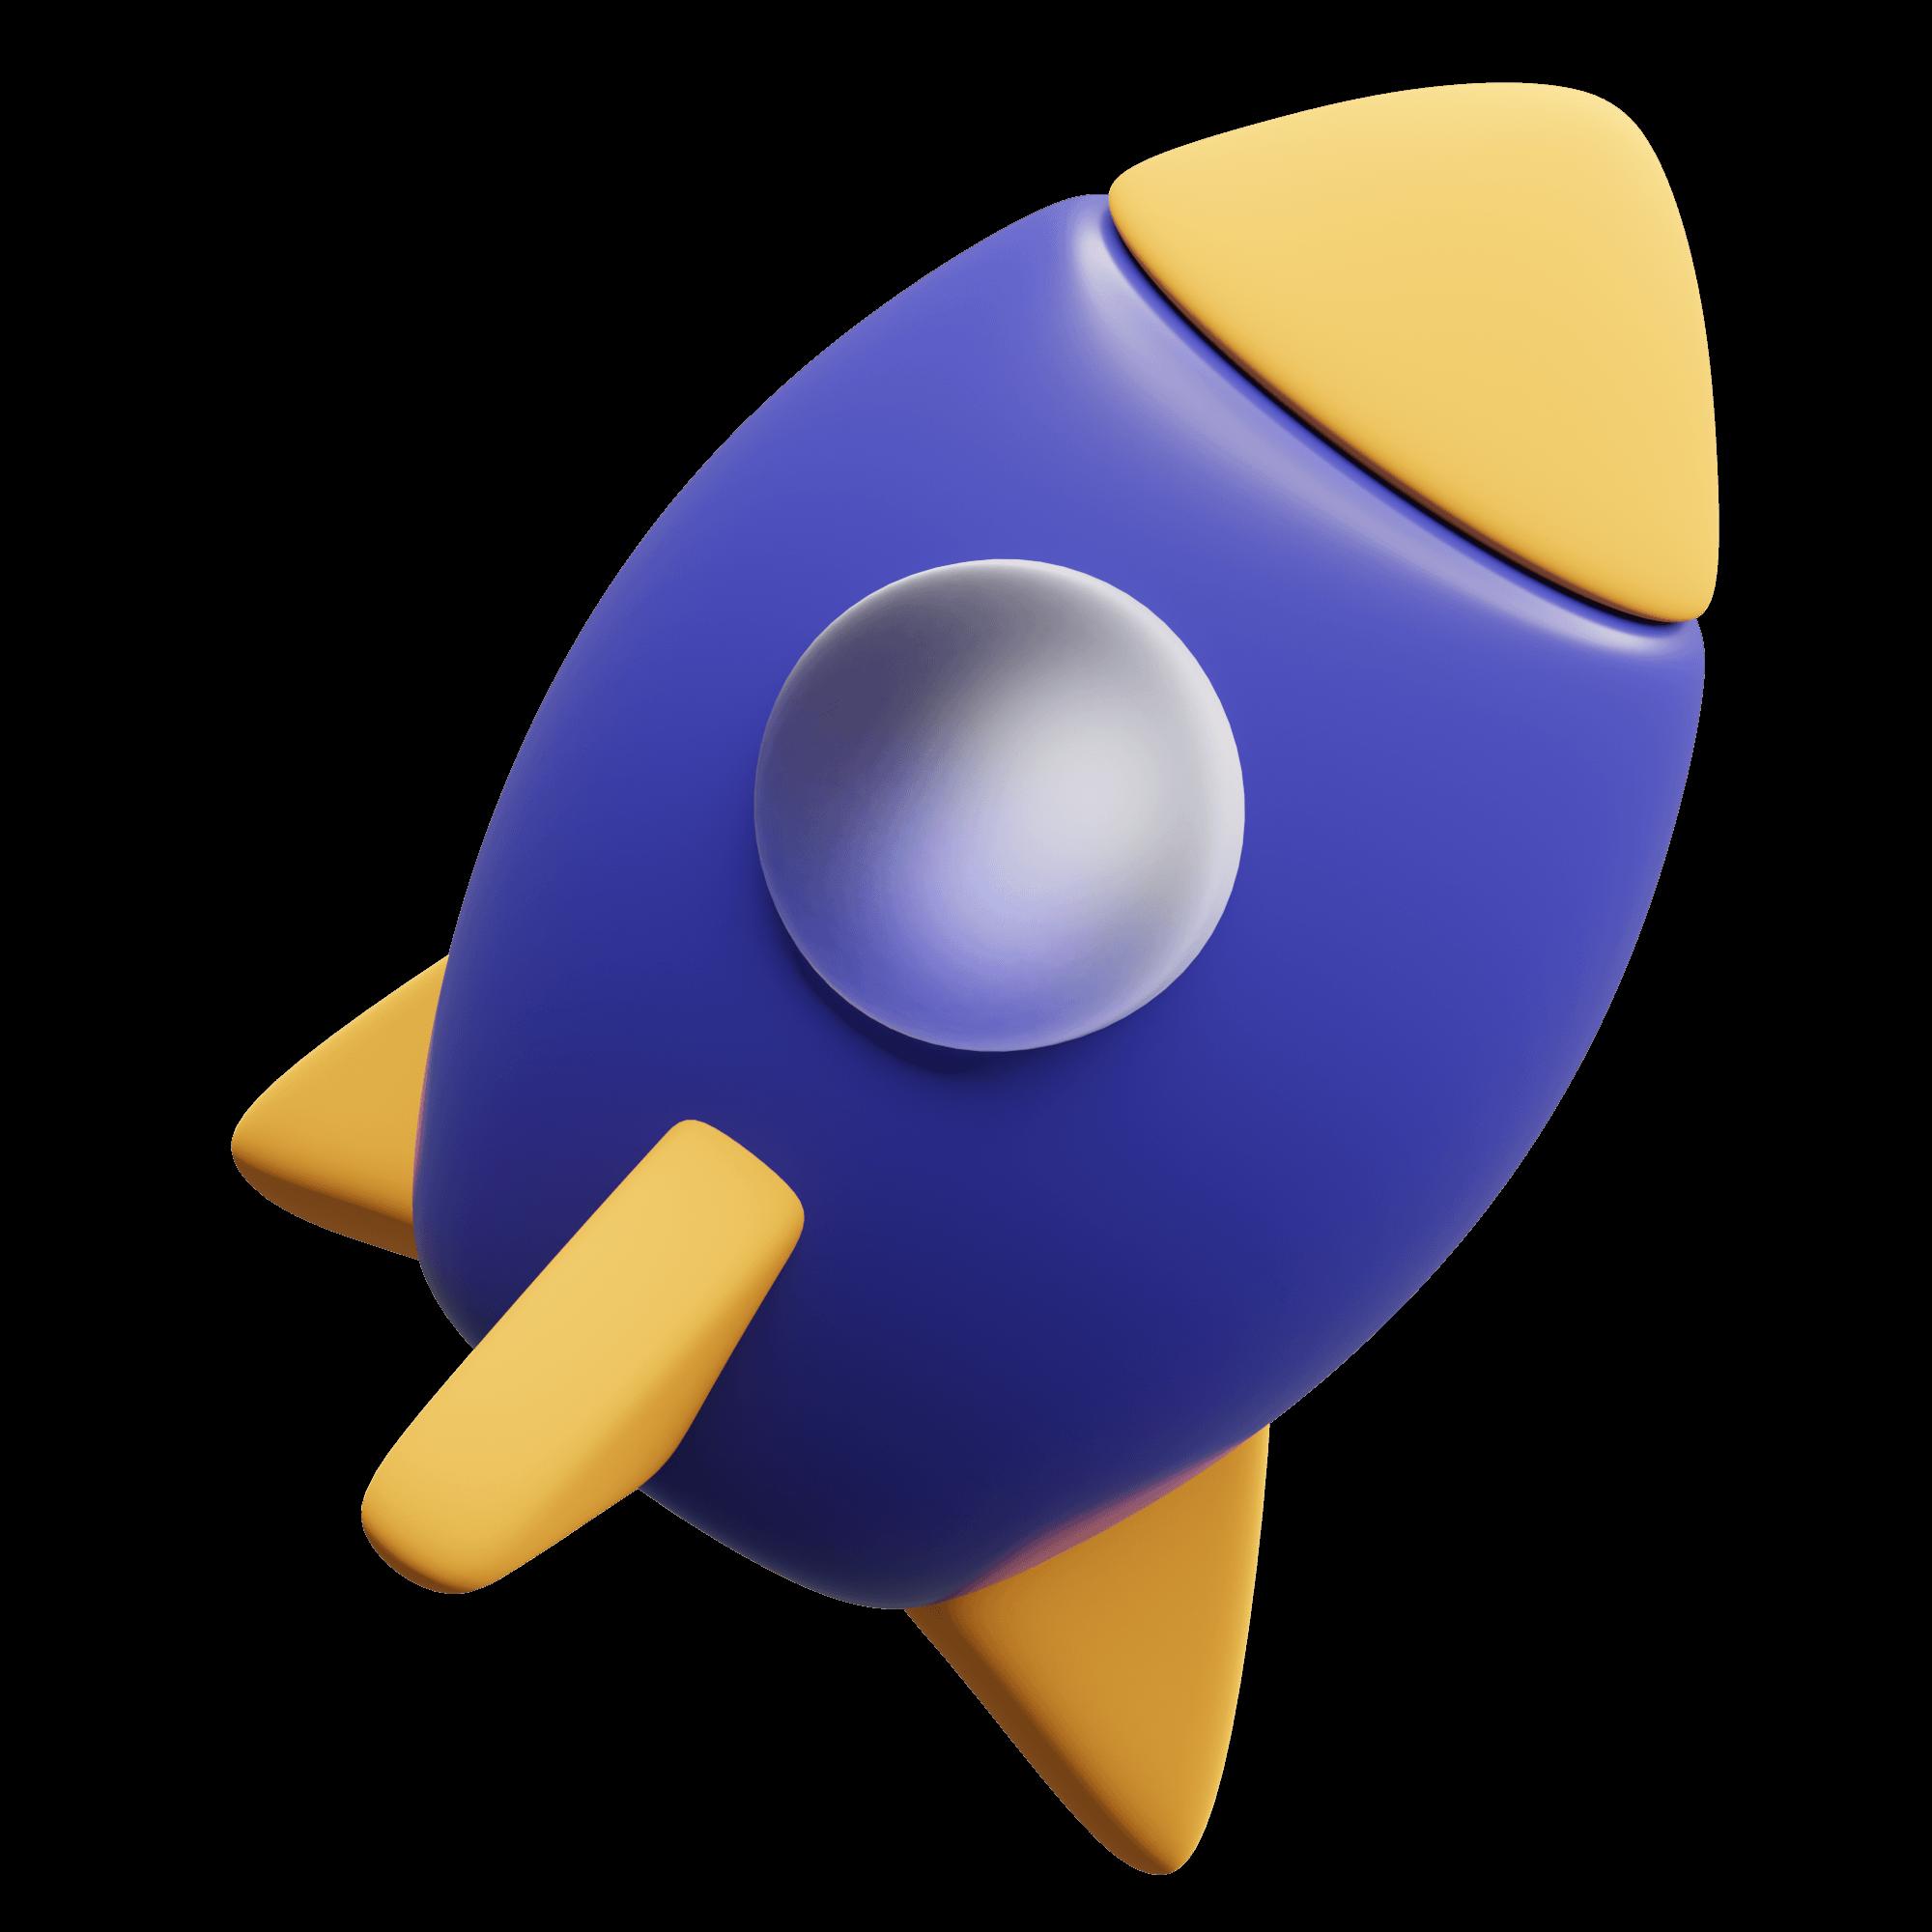 purple rocket ship